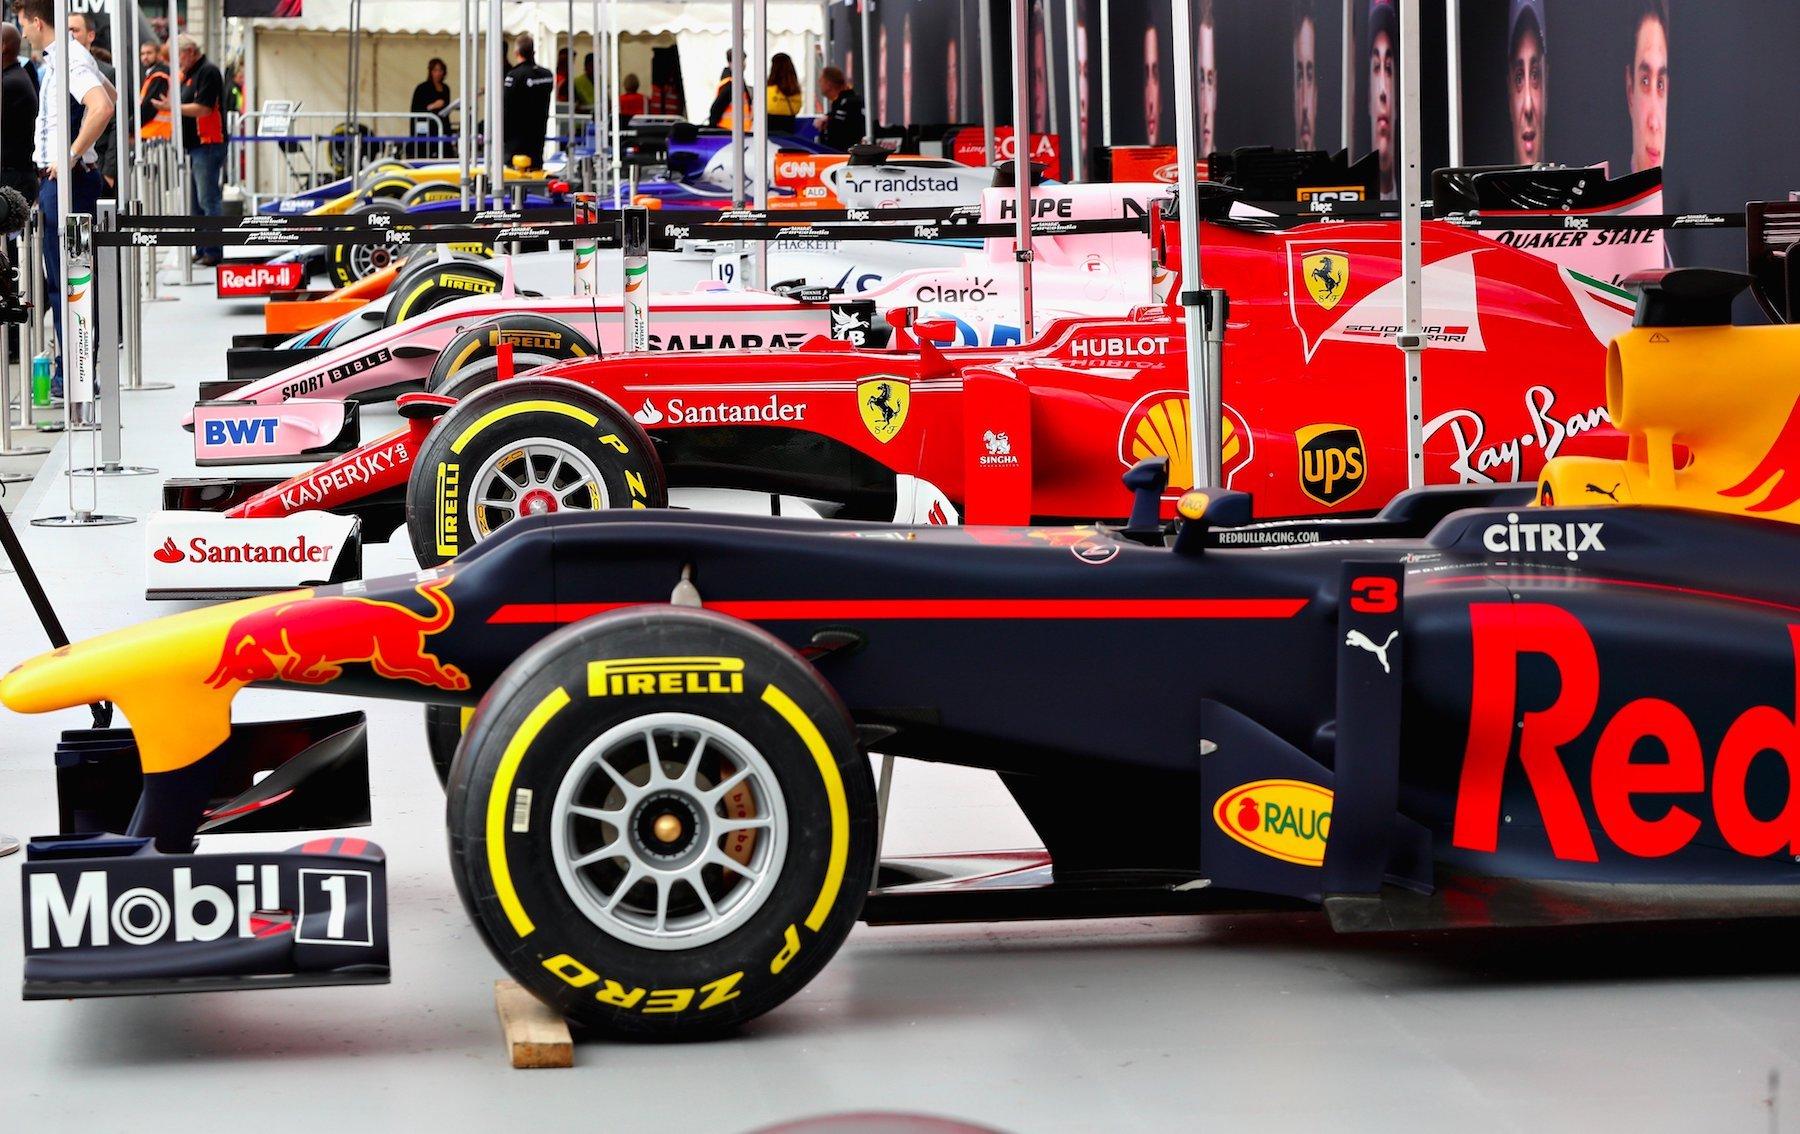 2017 F1 Live London 1 copy.jpg